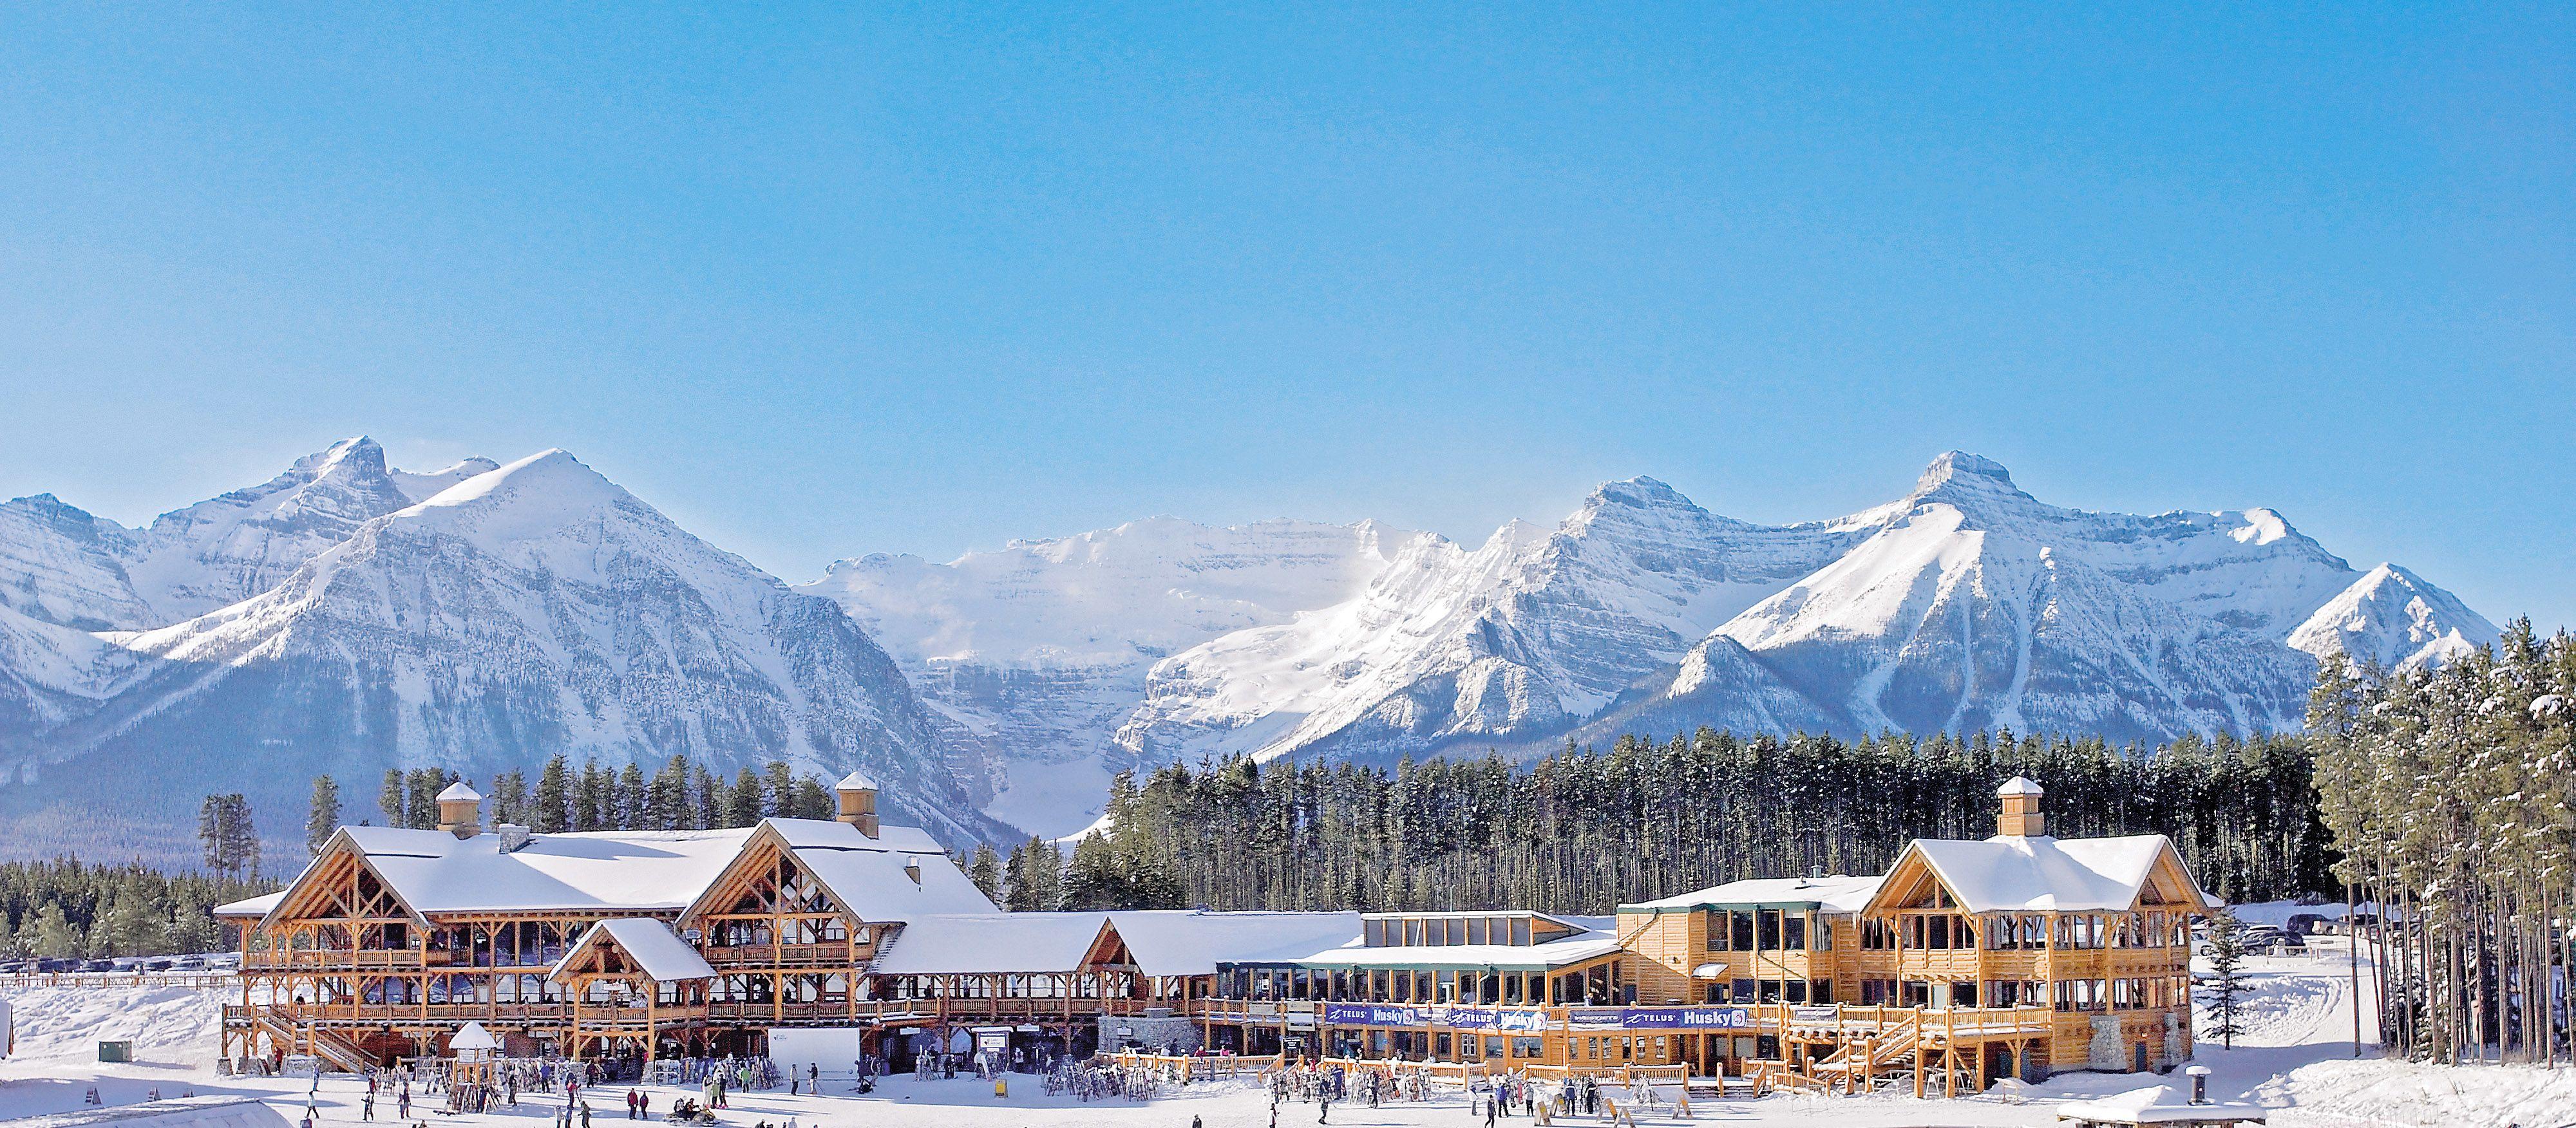 Lake Louise Ski Area Day Lodge